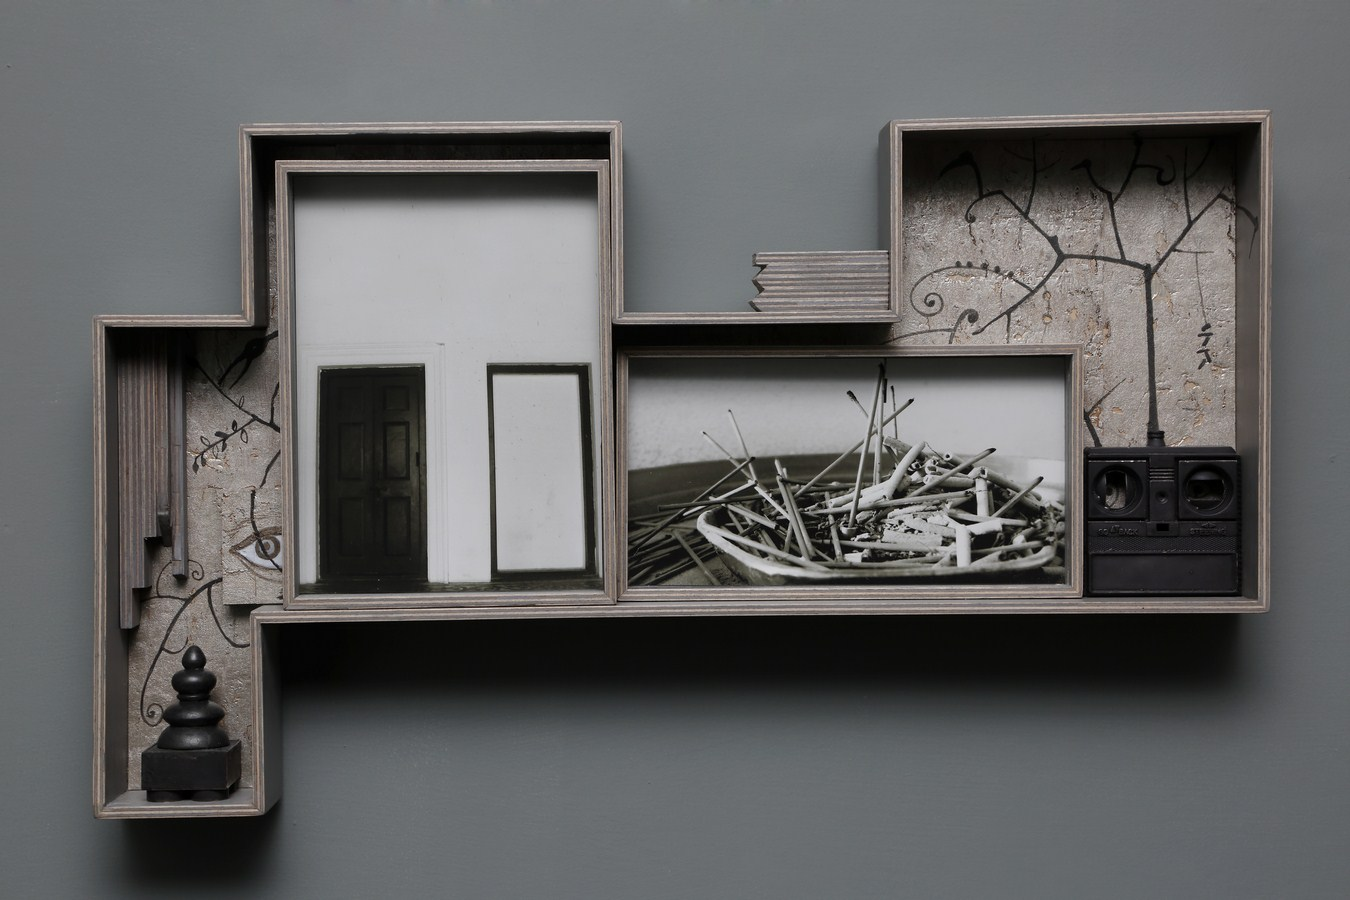 "Dweller of Metropolis - VII | Photograph, plywood, wood, acrylic, wallpaper, auto paint | 14.5"" x 24.5"" | 2017"